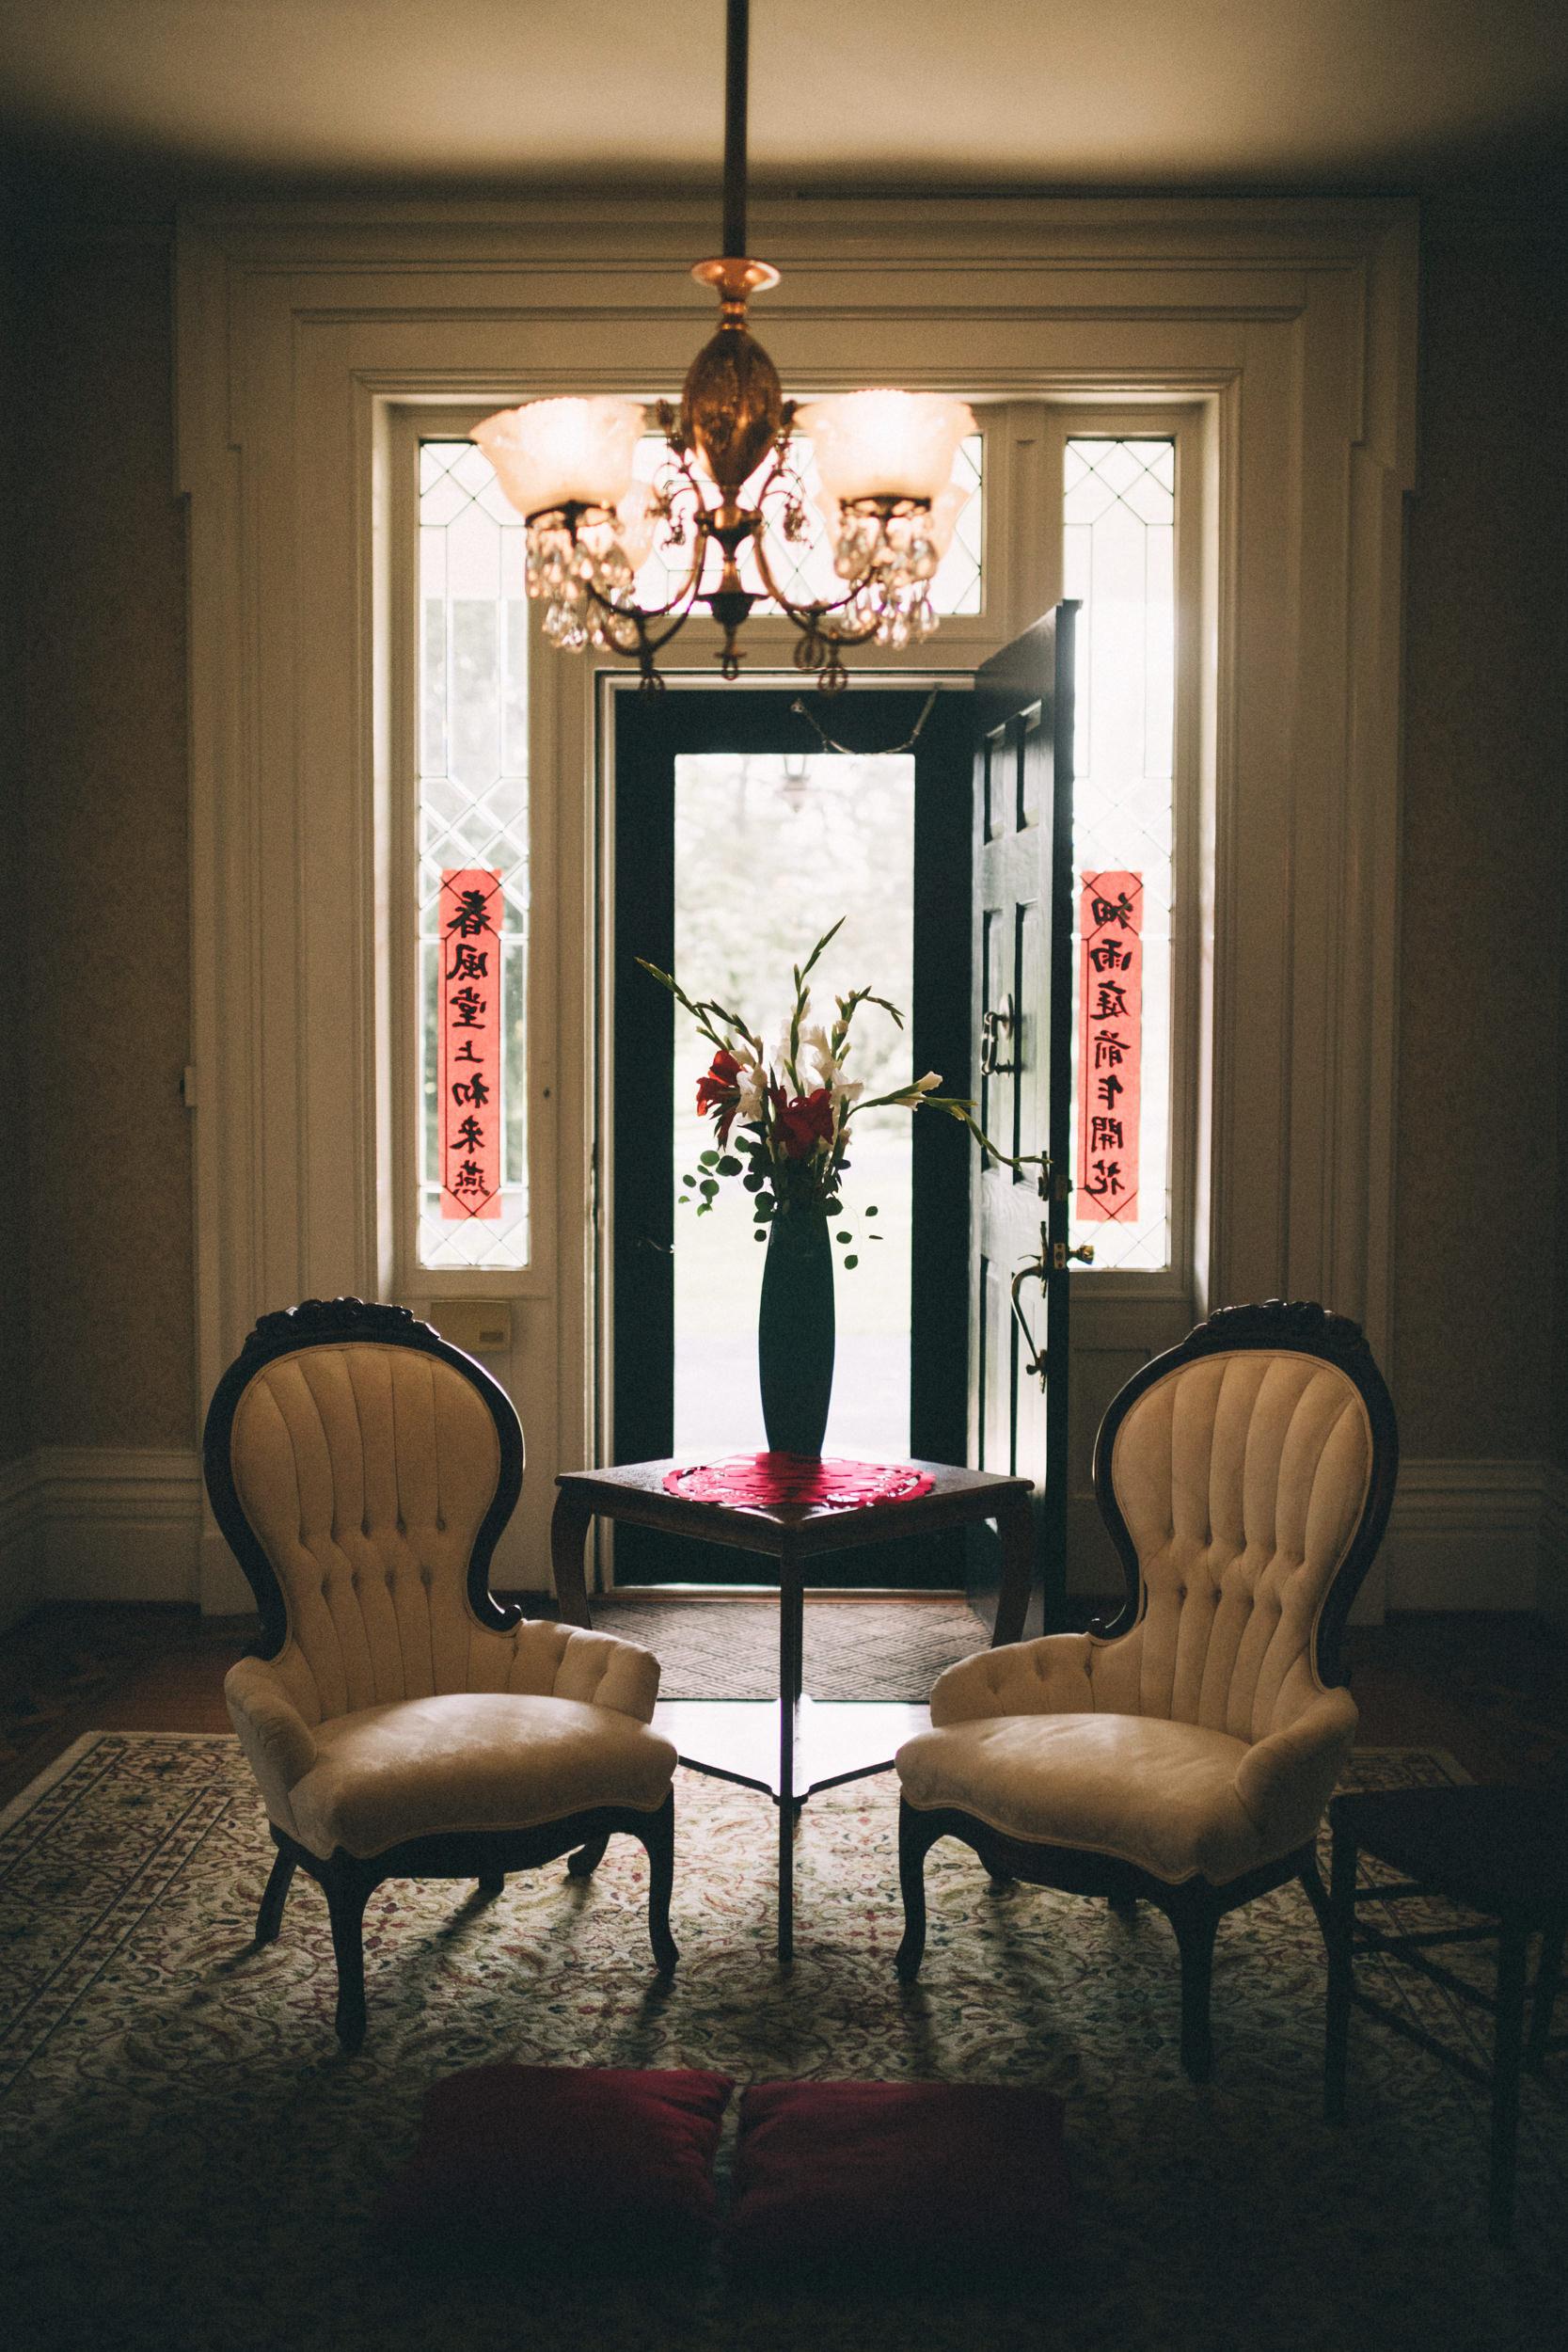 Louisville-Kentucky-Wedding-and-Elopement-Photographer-Sarah-Katherine-Davis-Photography-Summer-Jewel-Toned-Wedding-Chineese-Tea-Ceremony-Warrenwood-Manor-Danville-326.jpg